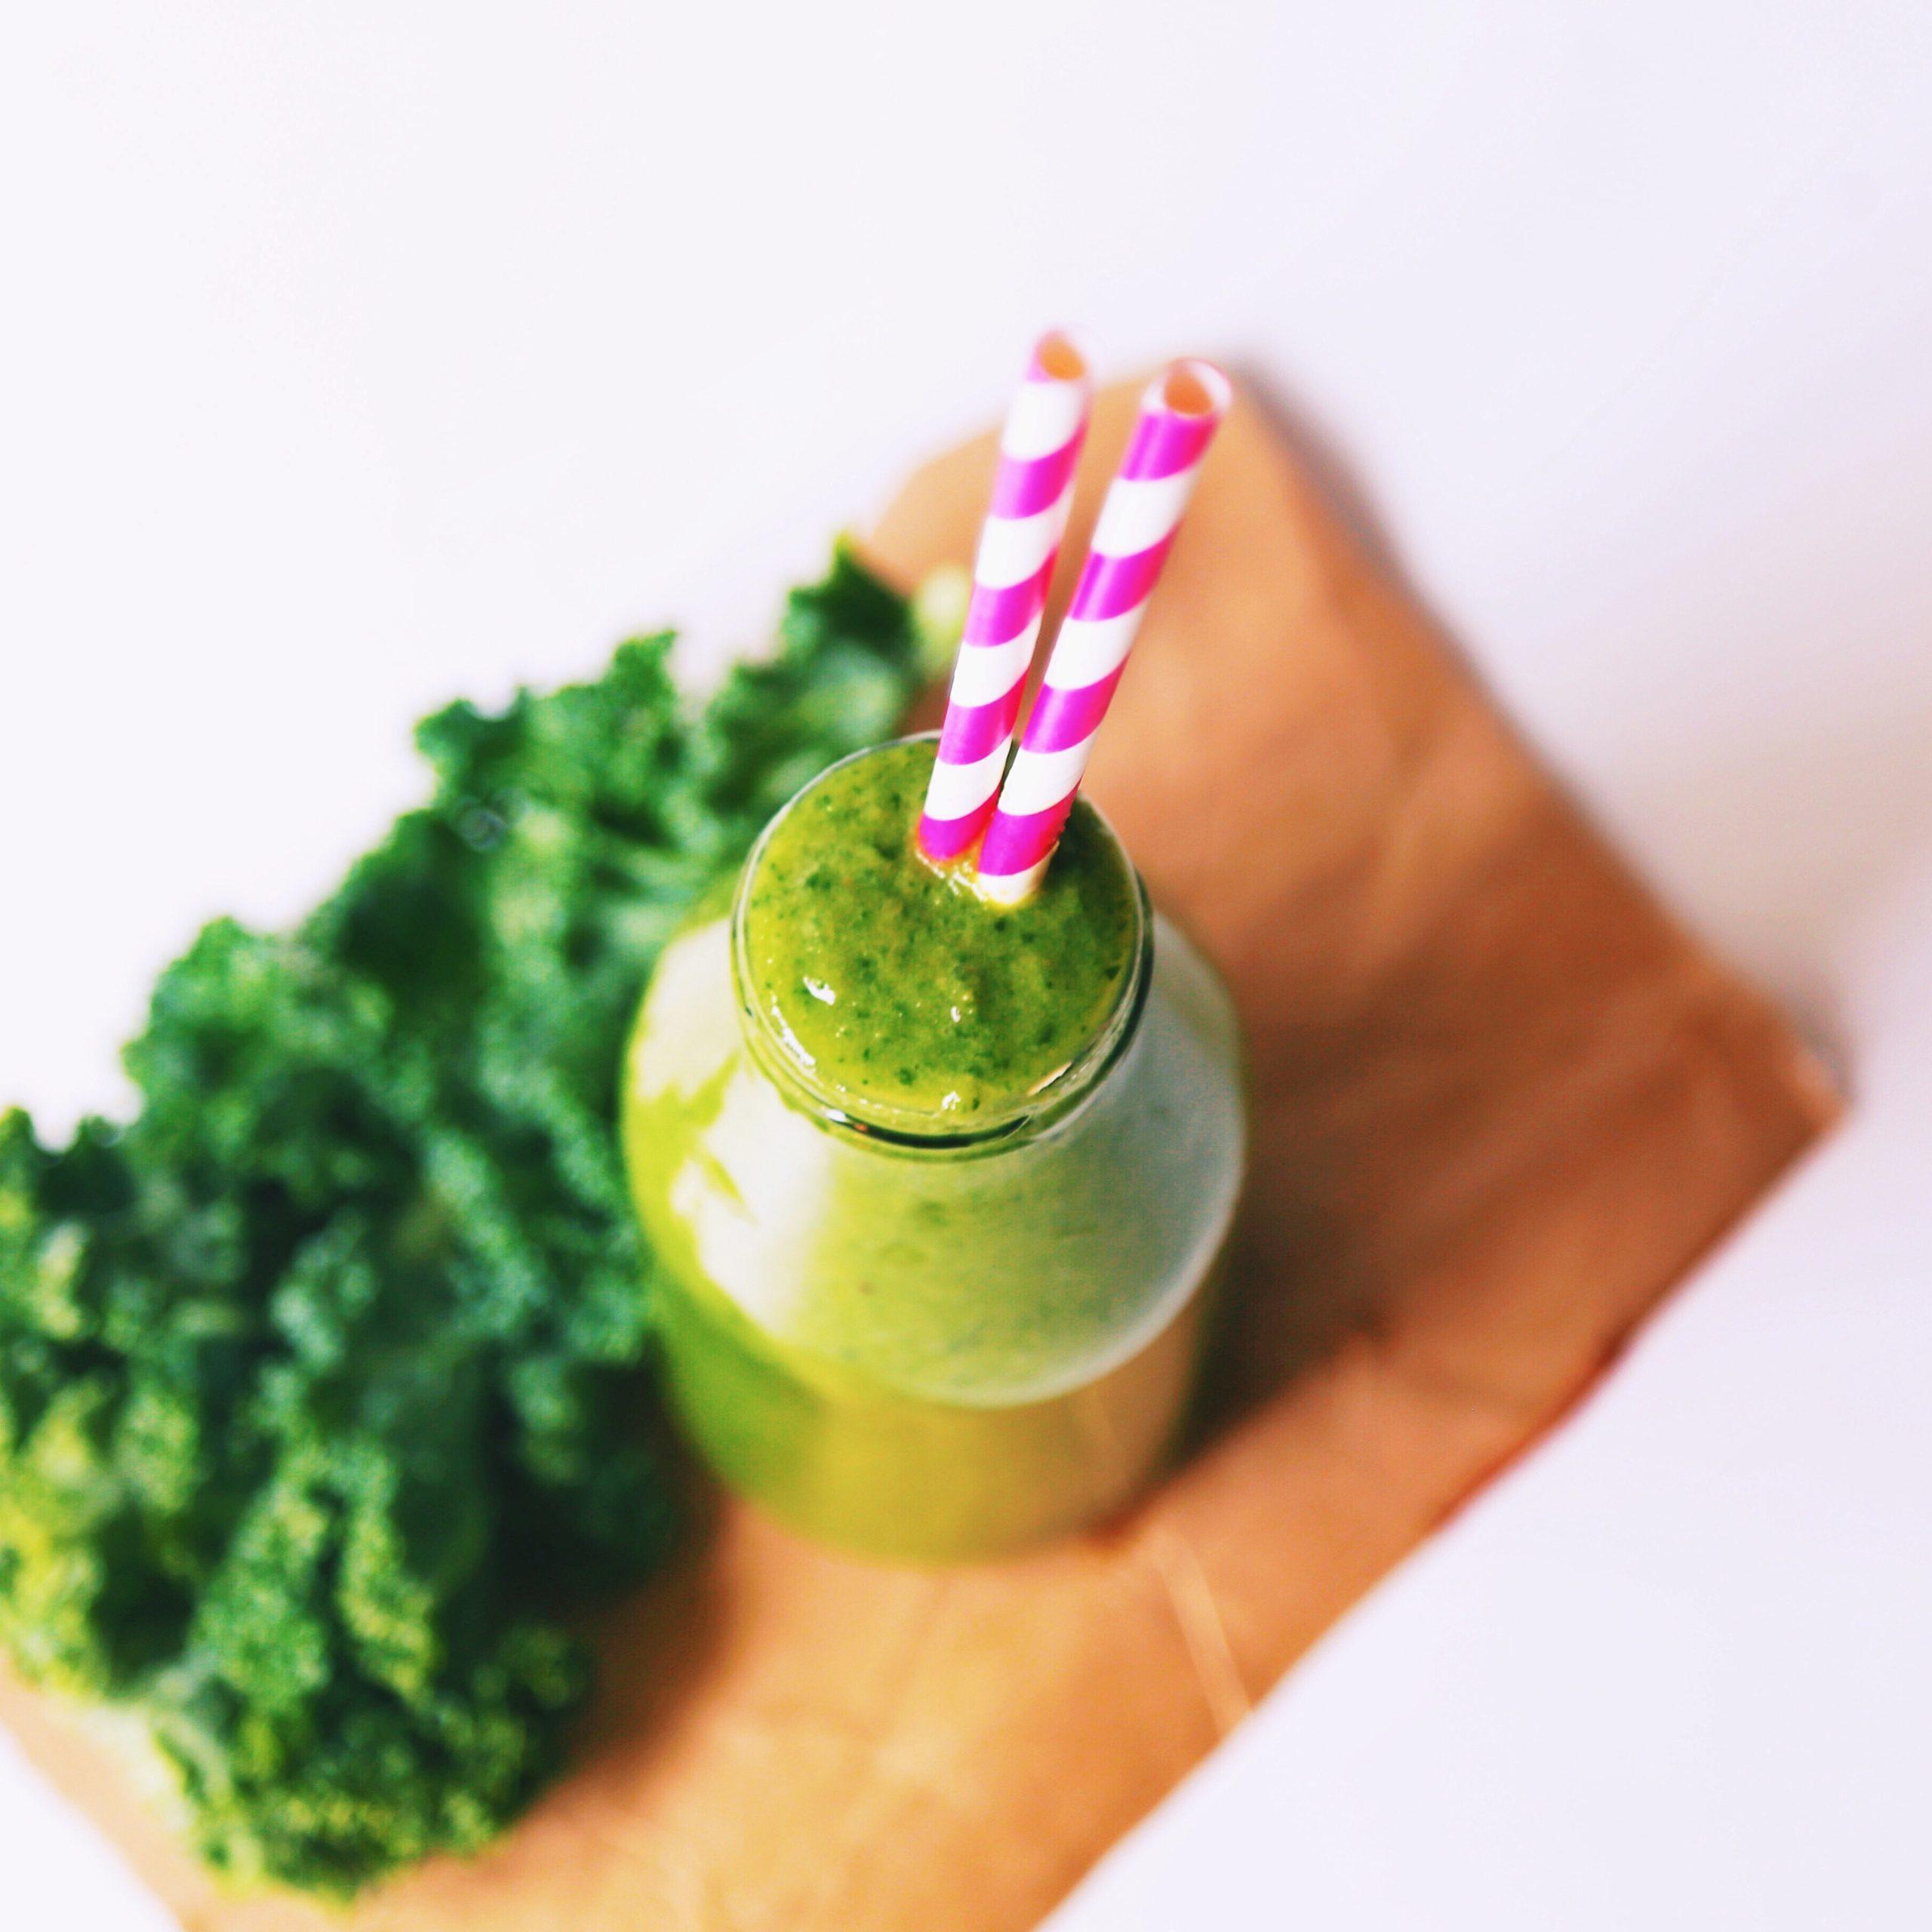 Green kale smoothie recipe